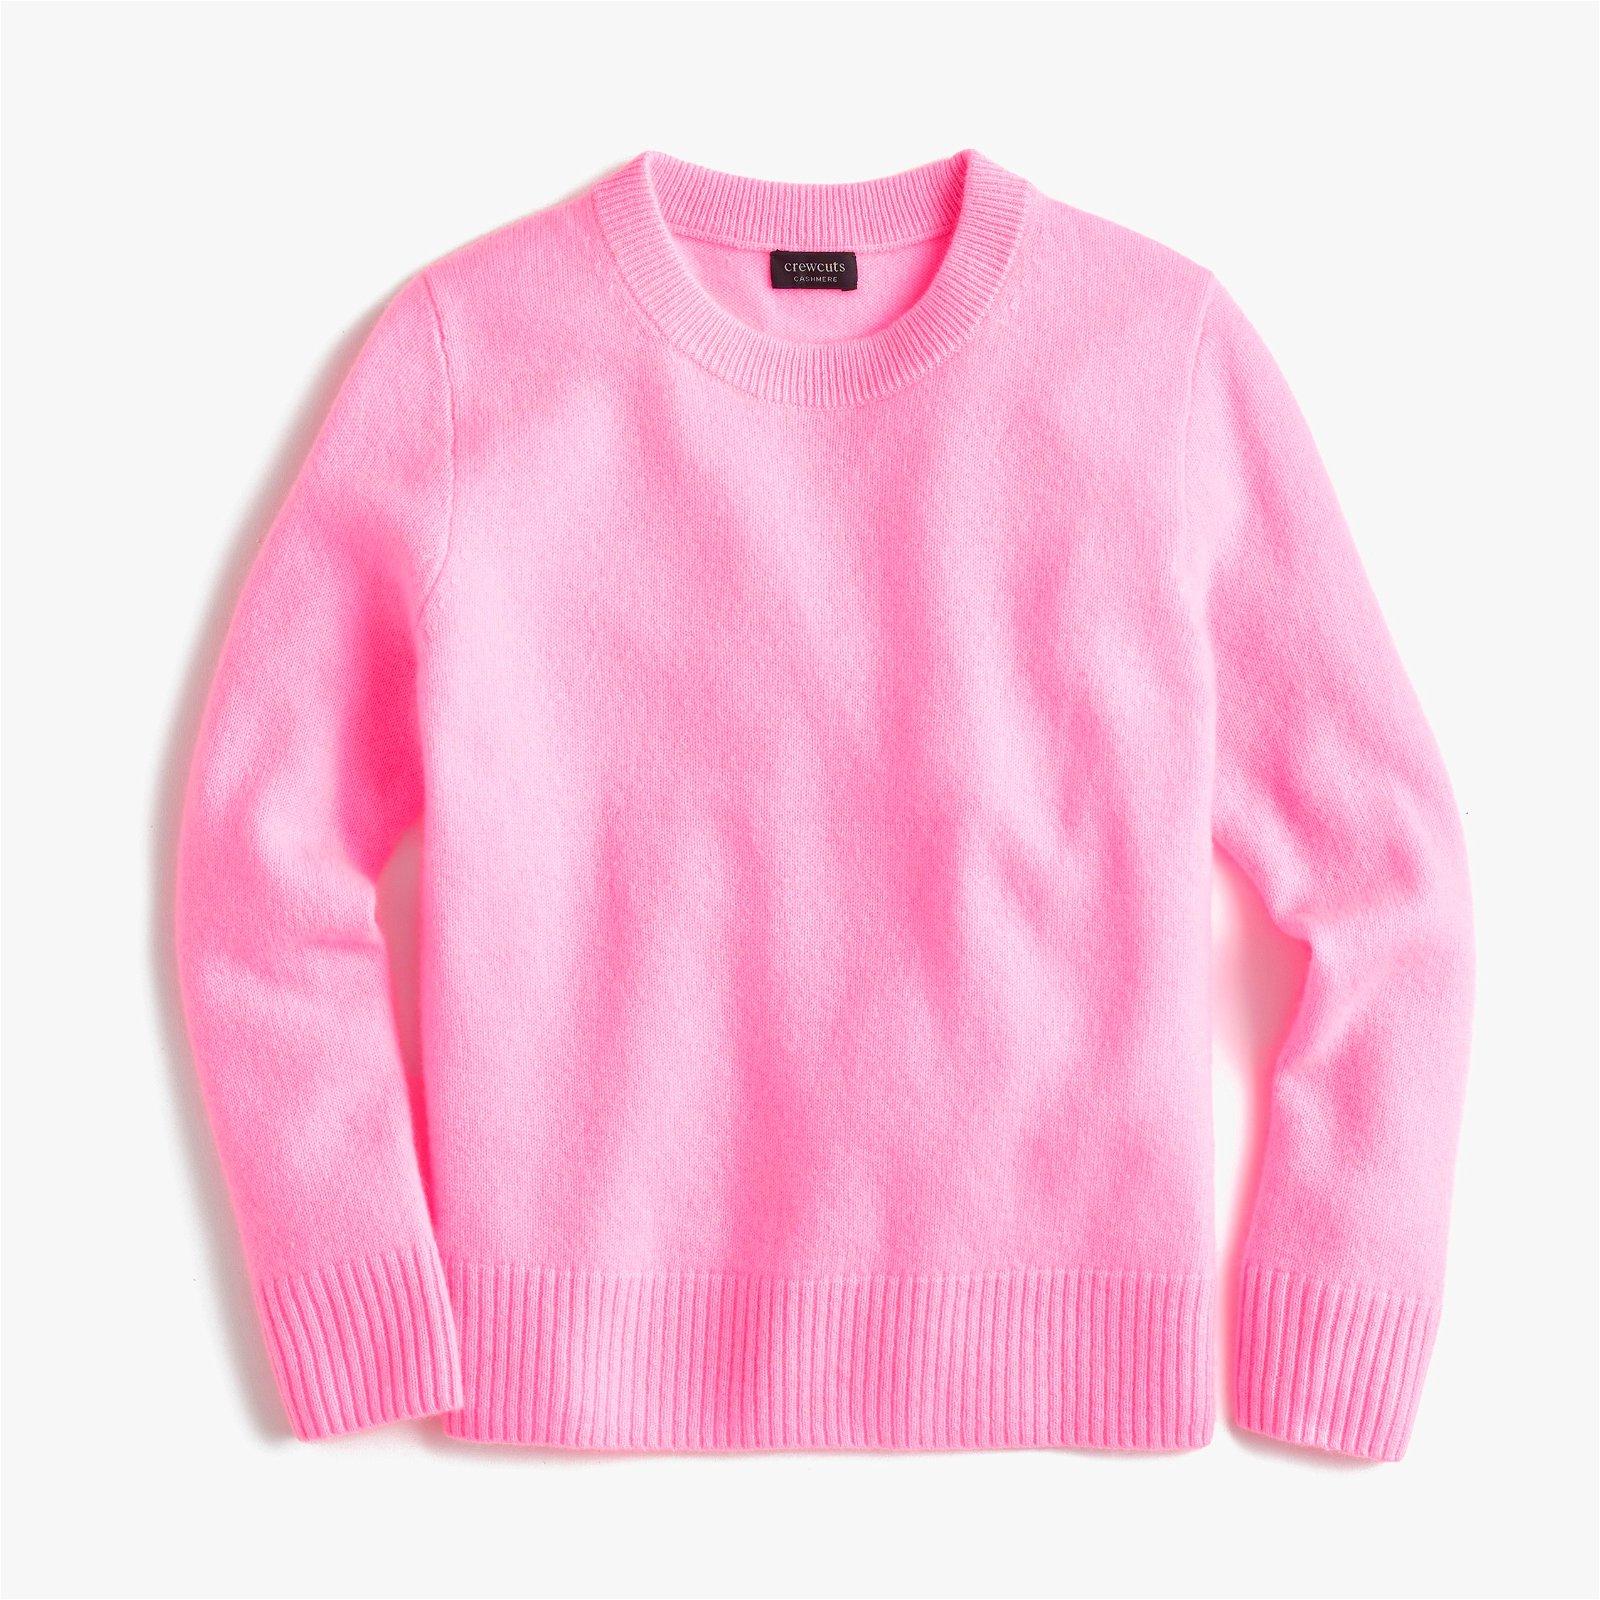 Kids' cashmere crewneck sweater